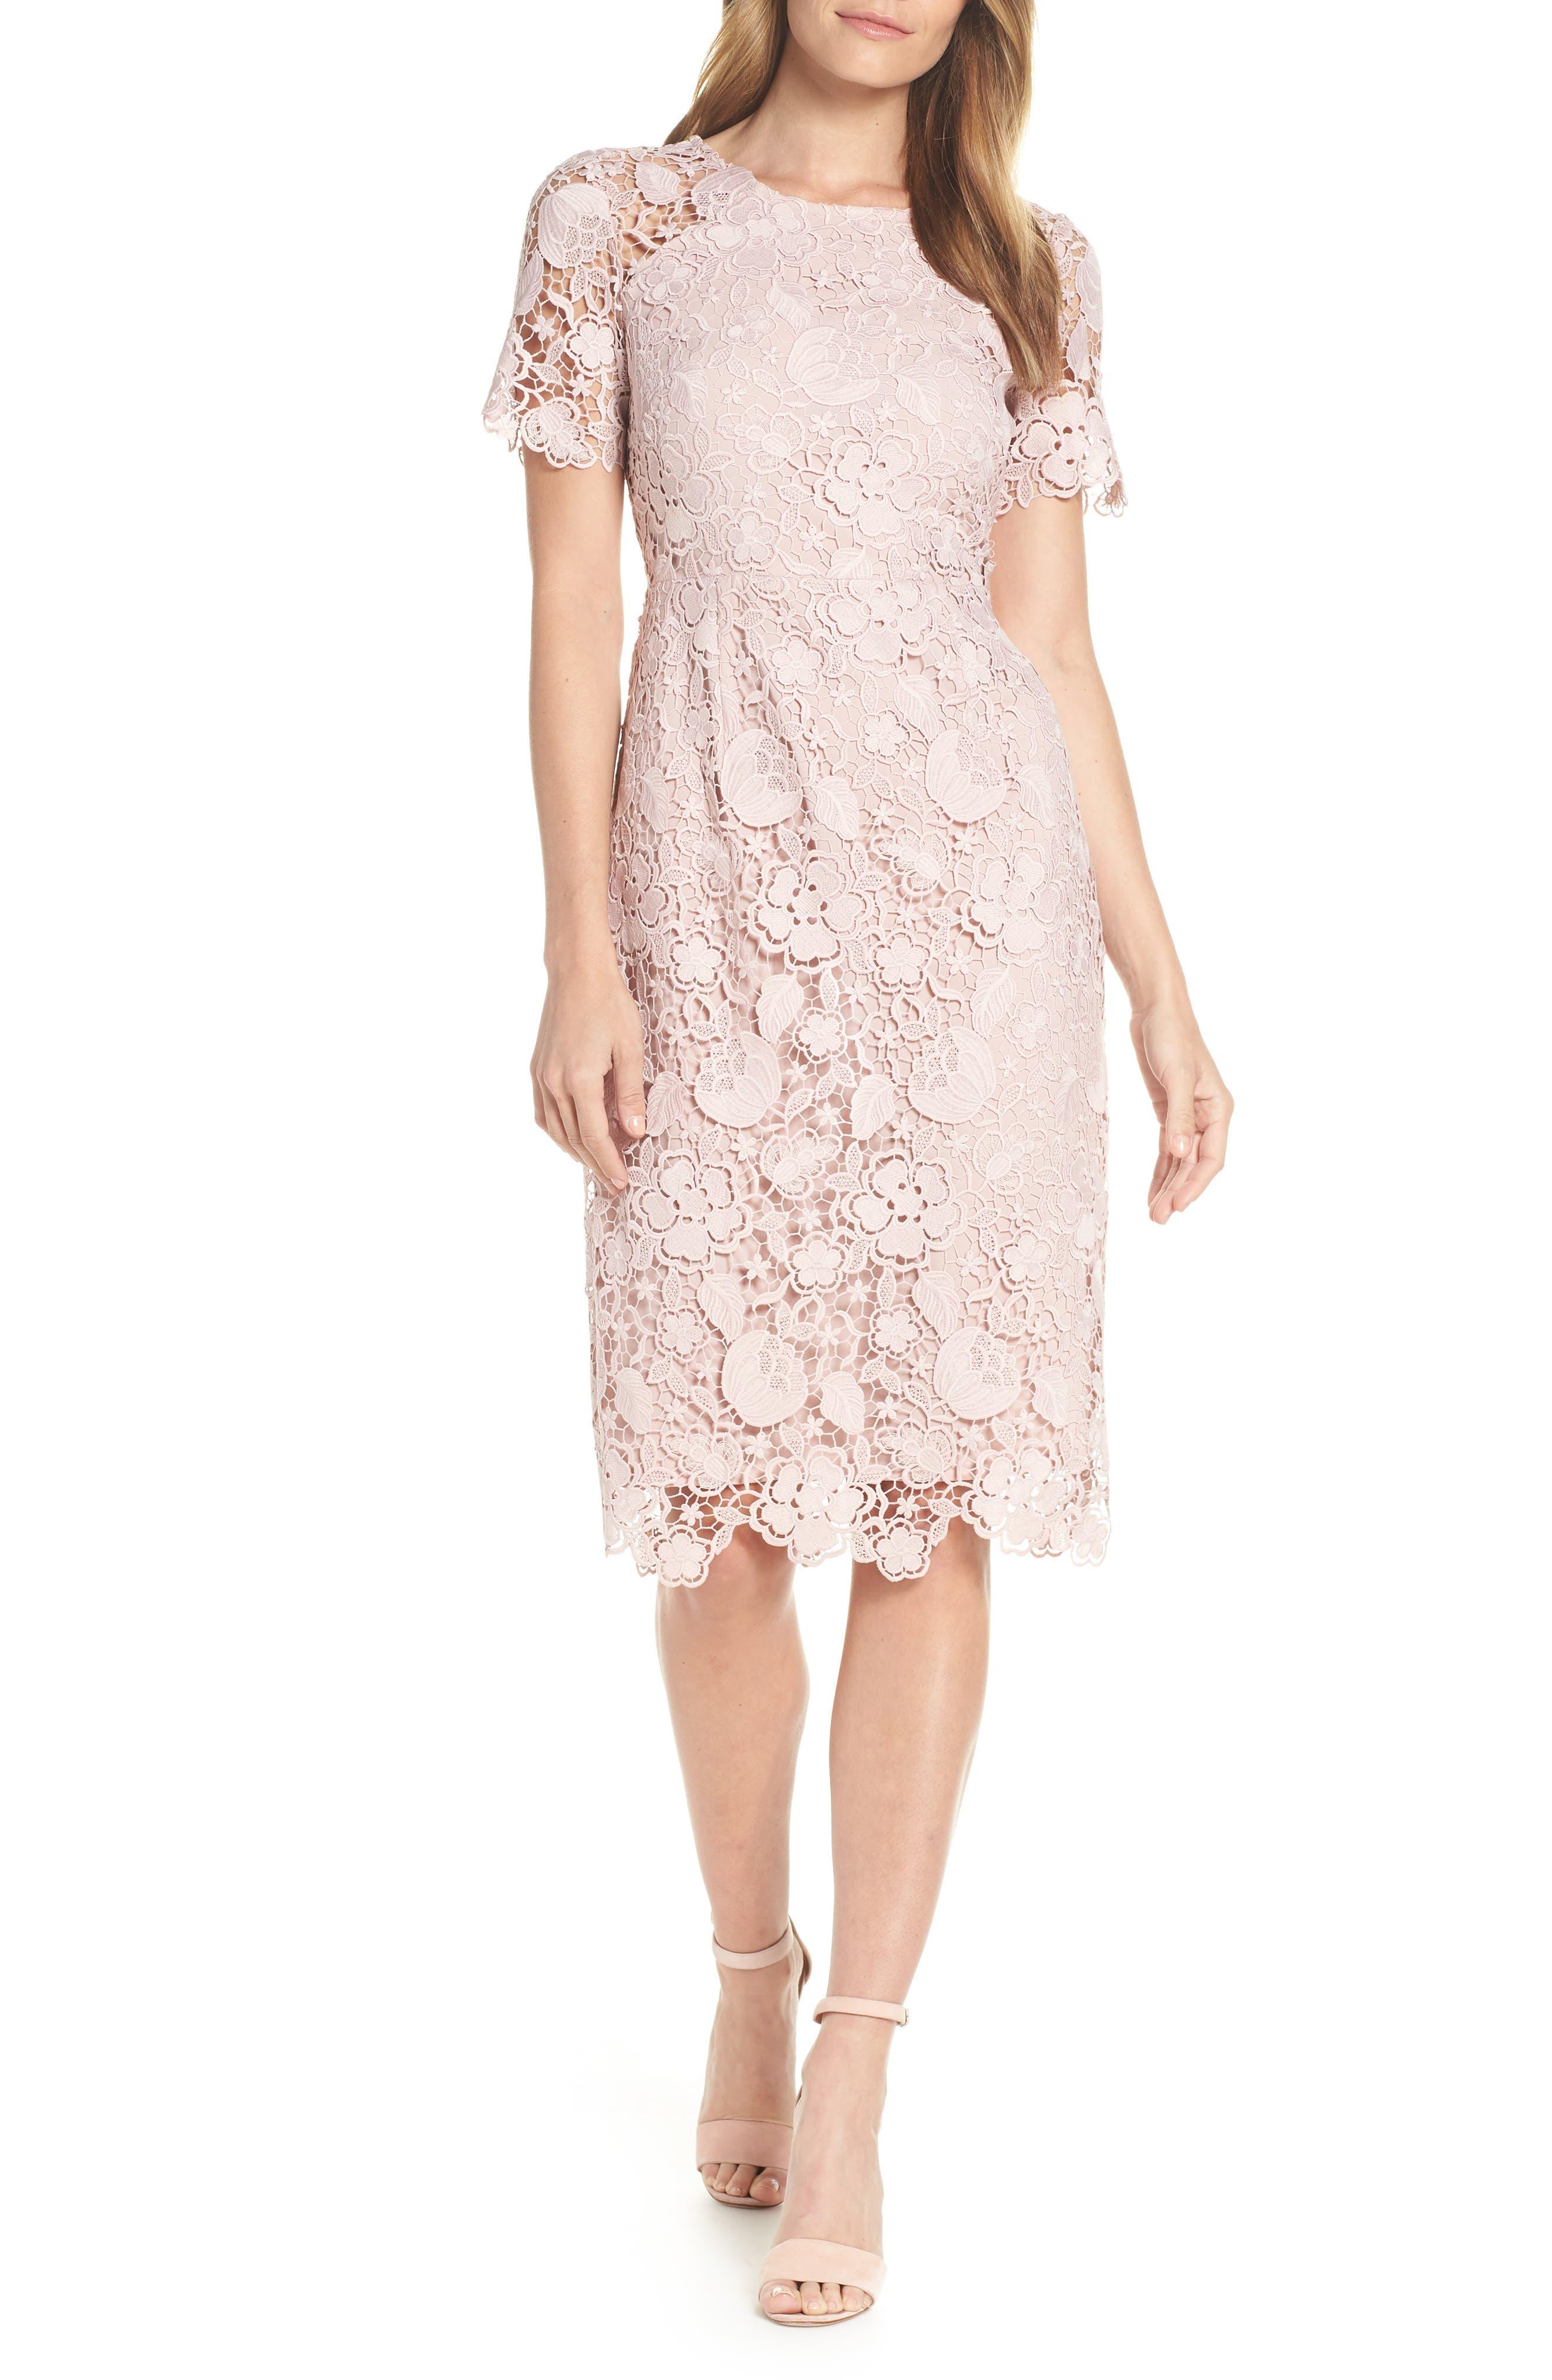 ELIZA J Embroidered Lace Sheath Dress, Main, color, NUDE